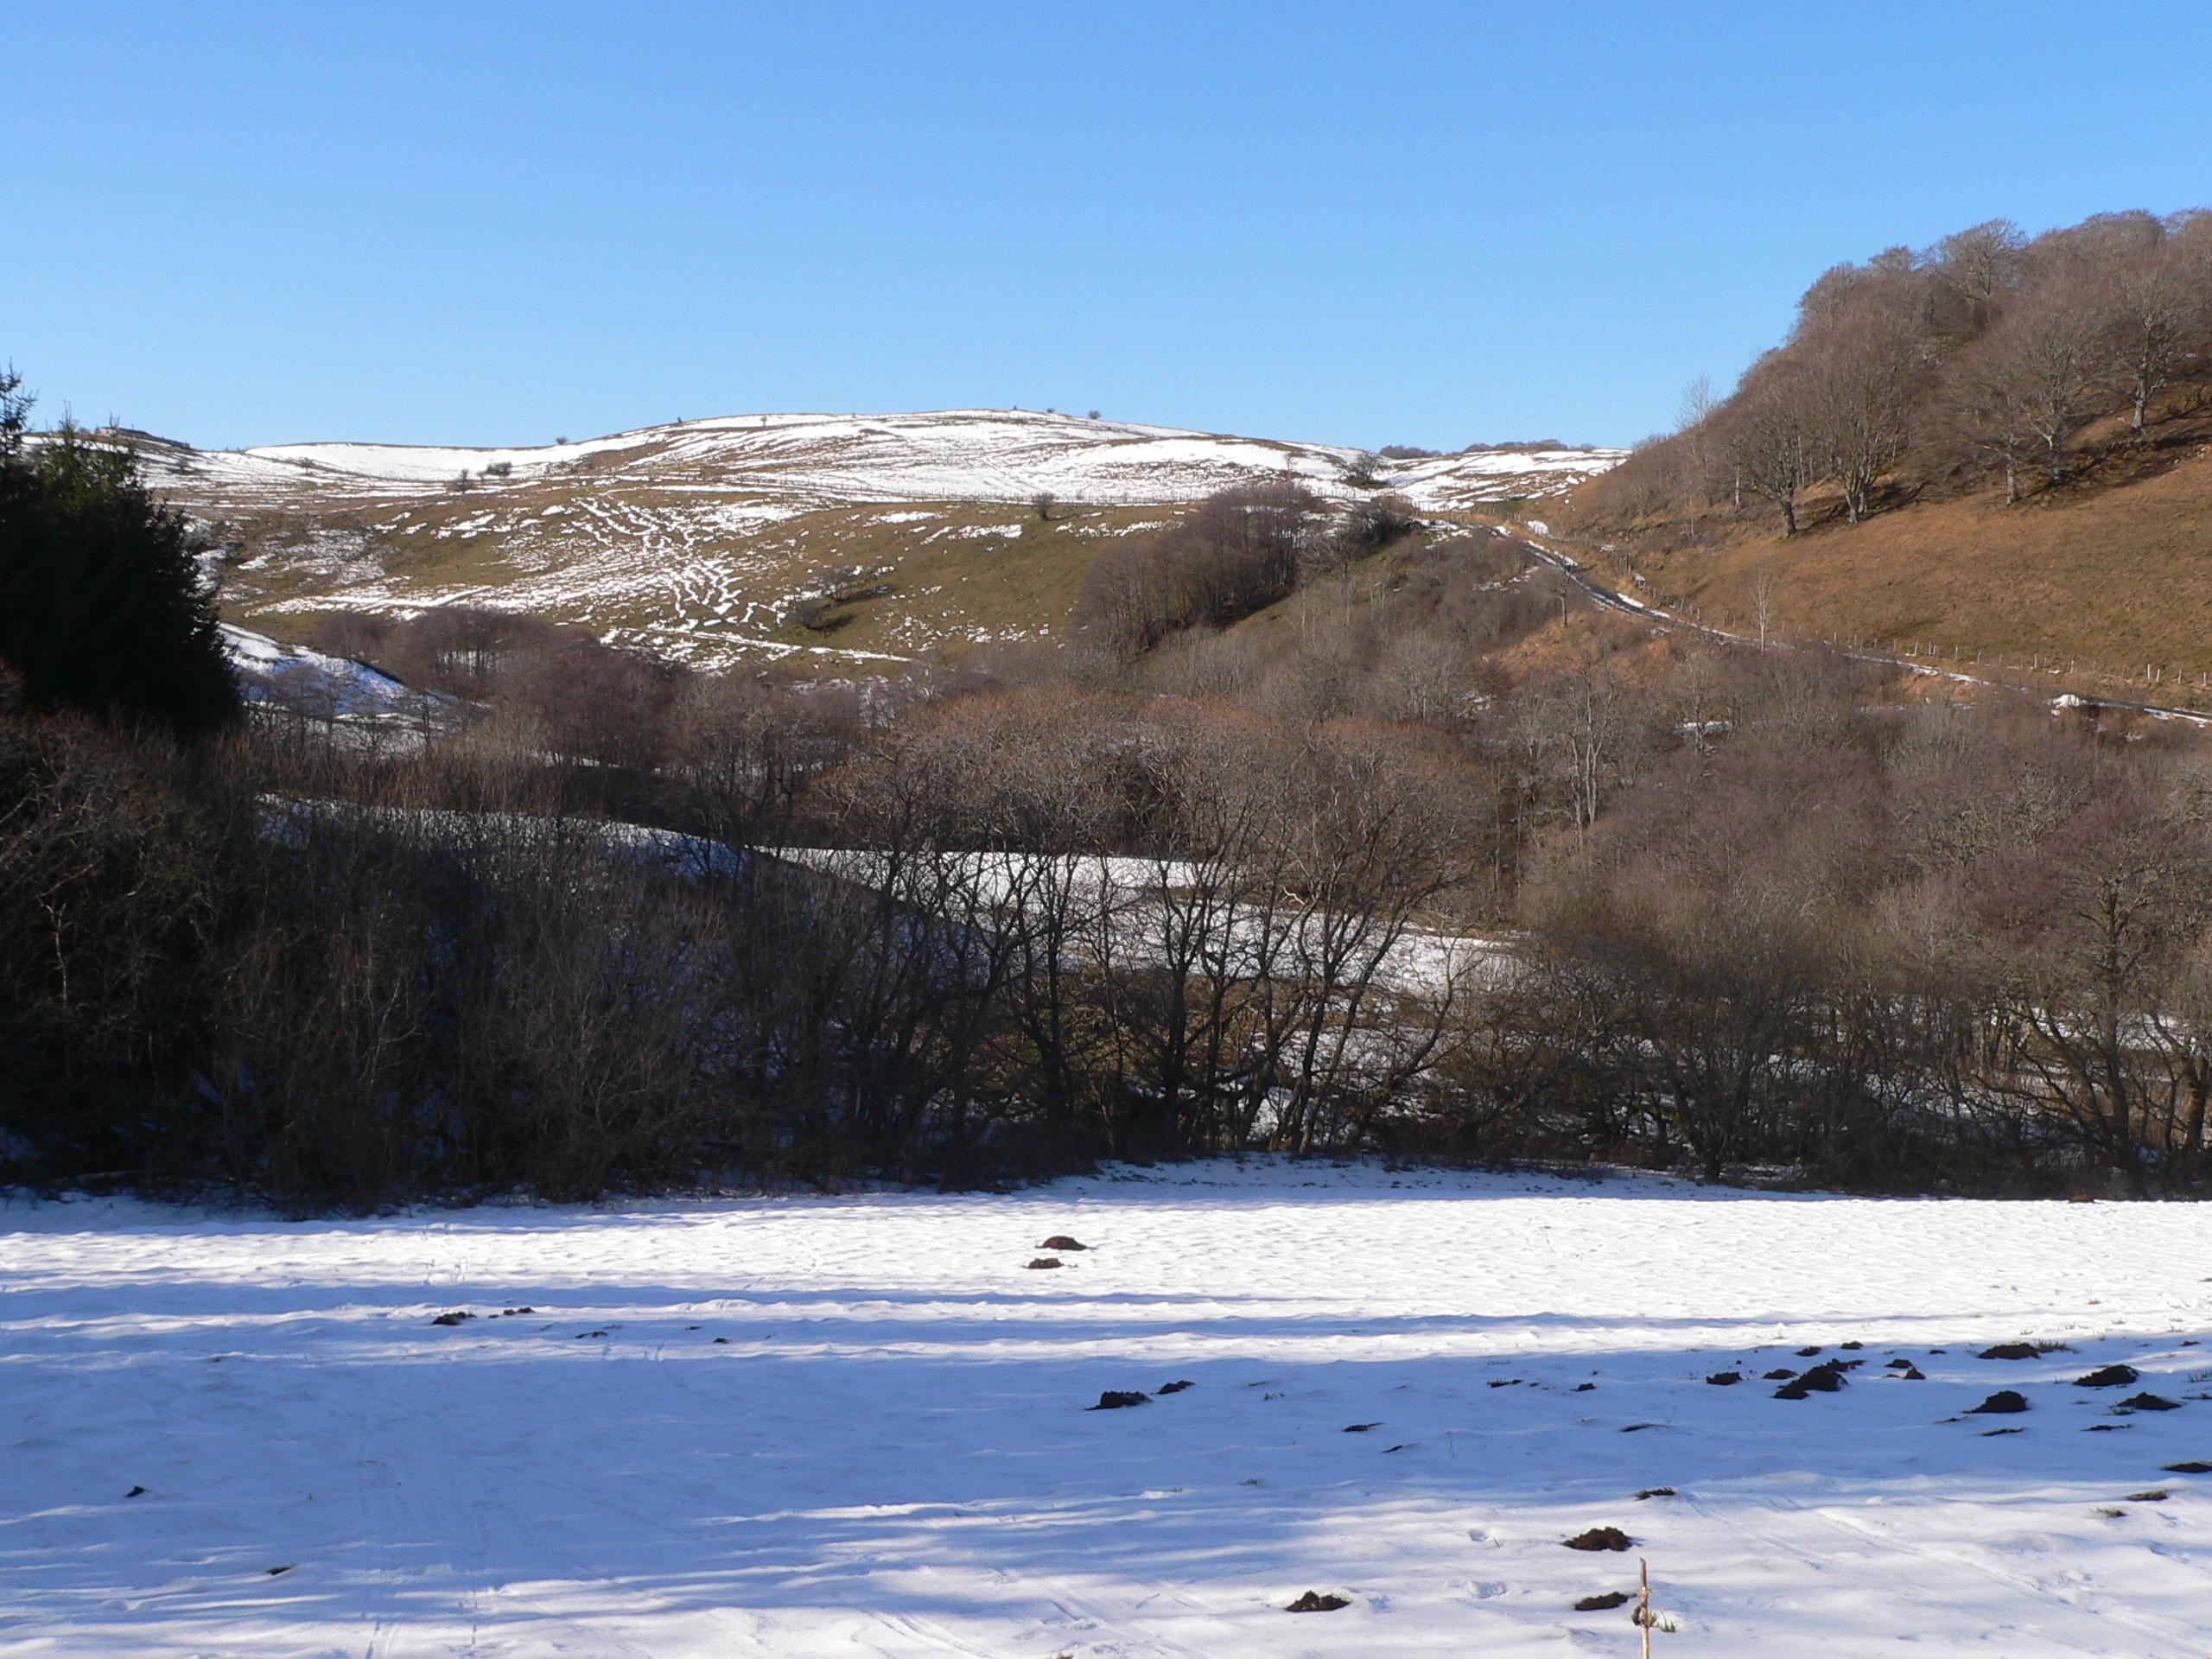 neige;hiver; auvergne; gîte